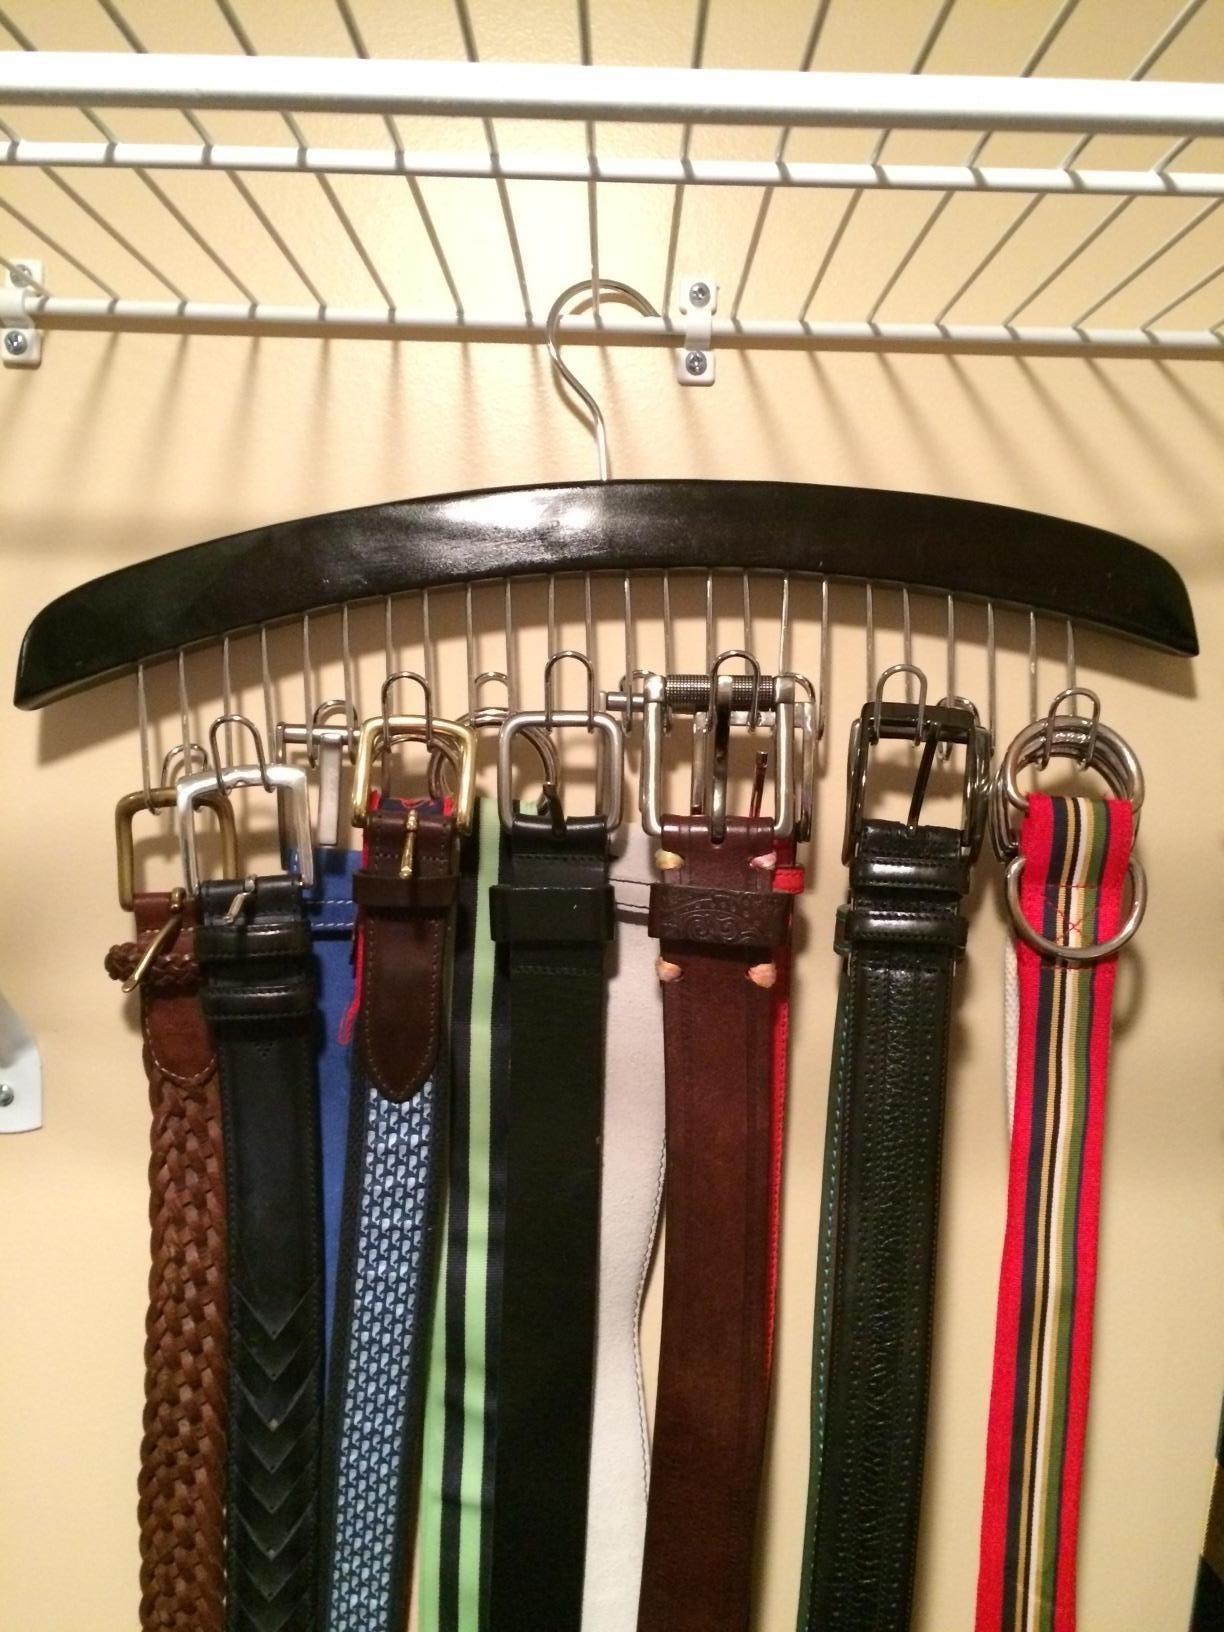 Reviewer photo of various belts hanging on belt hanger